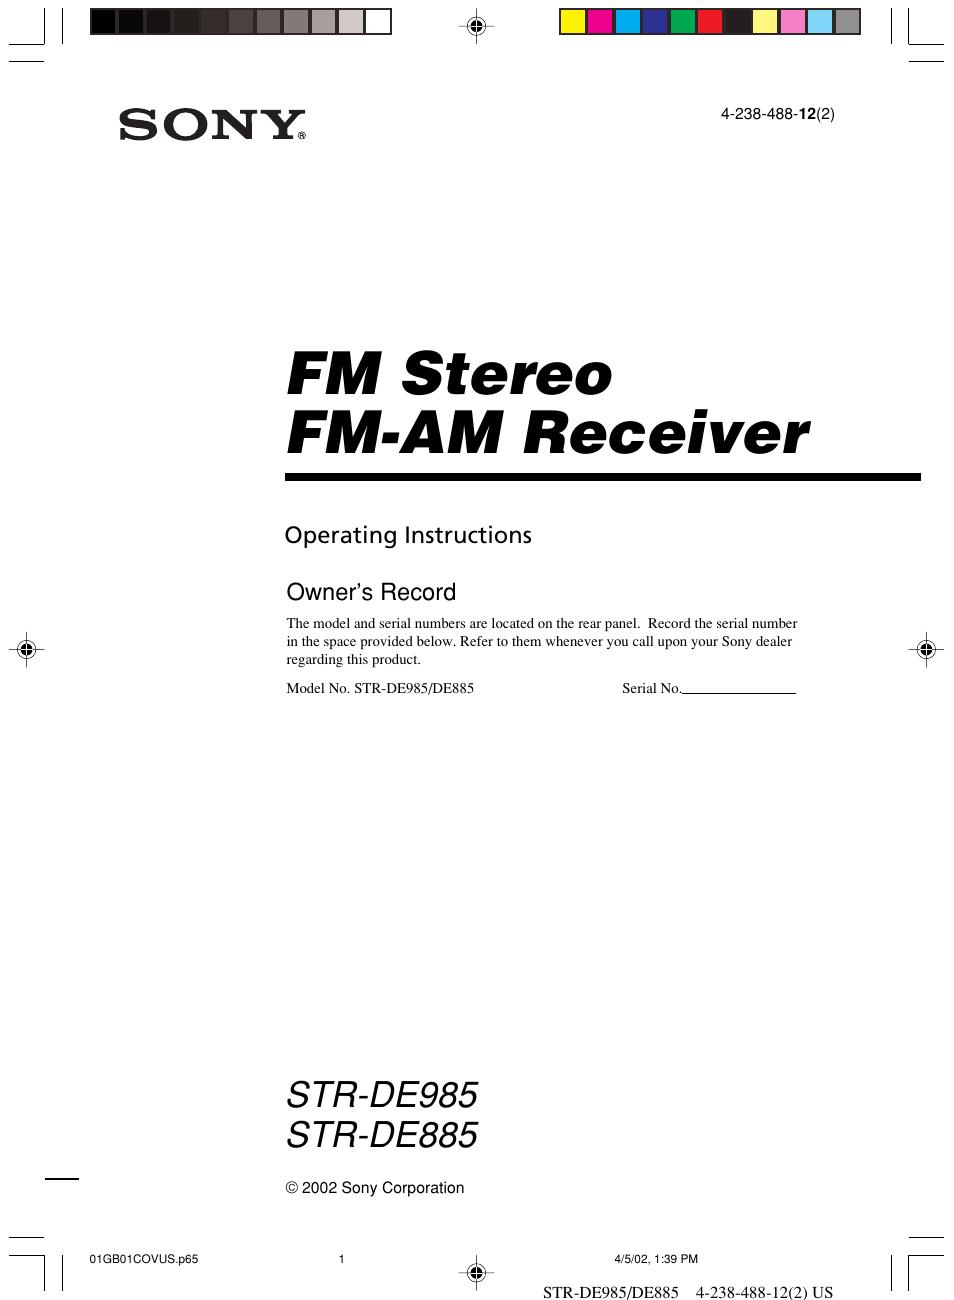 sony str de985 user manual 71 pages also for str de885 rm pp411 rh manualsdir com Sony STR De985 Manual sony receiver str de985 manual